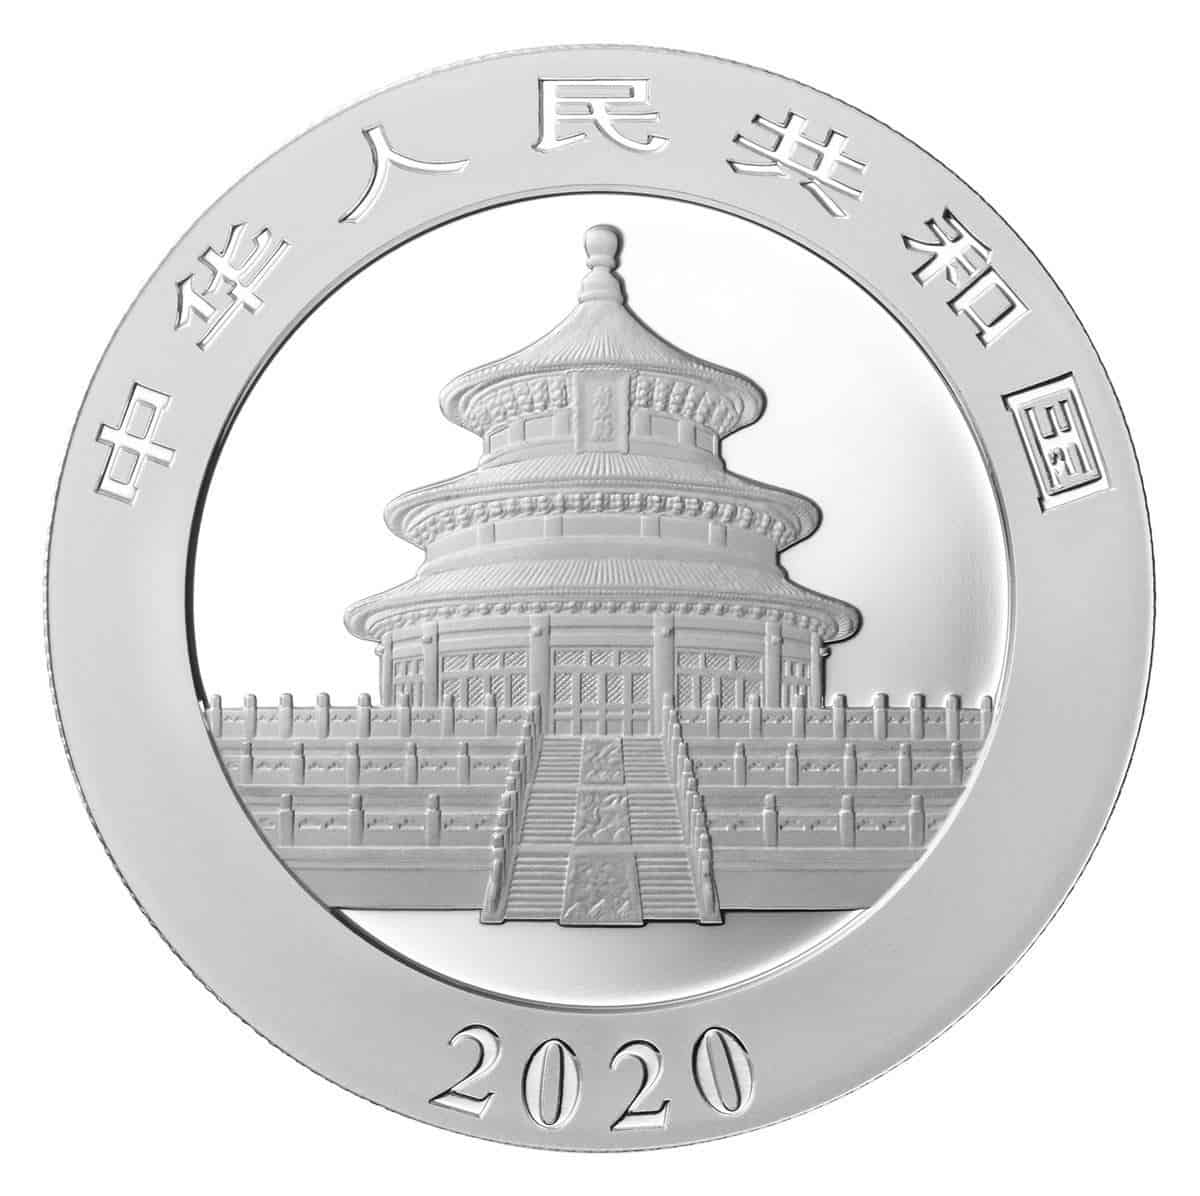 30g Silver Chinese Panda Coin, 2020